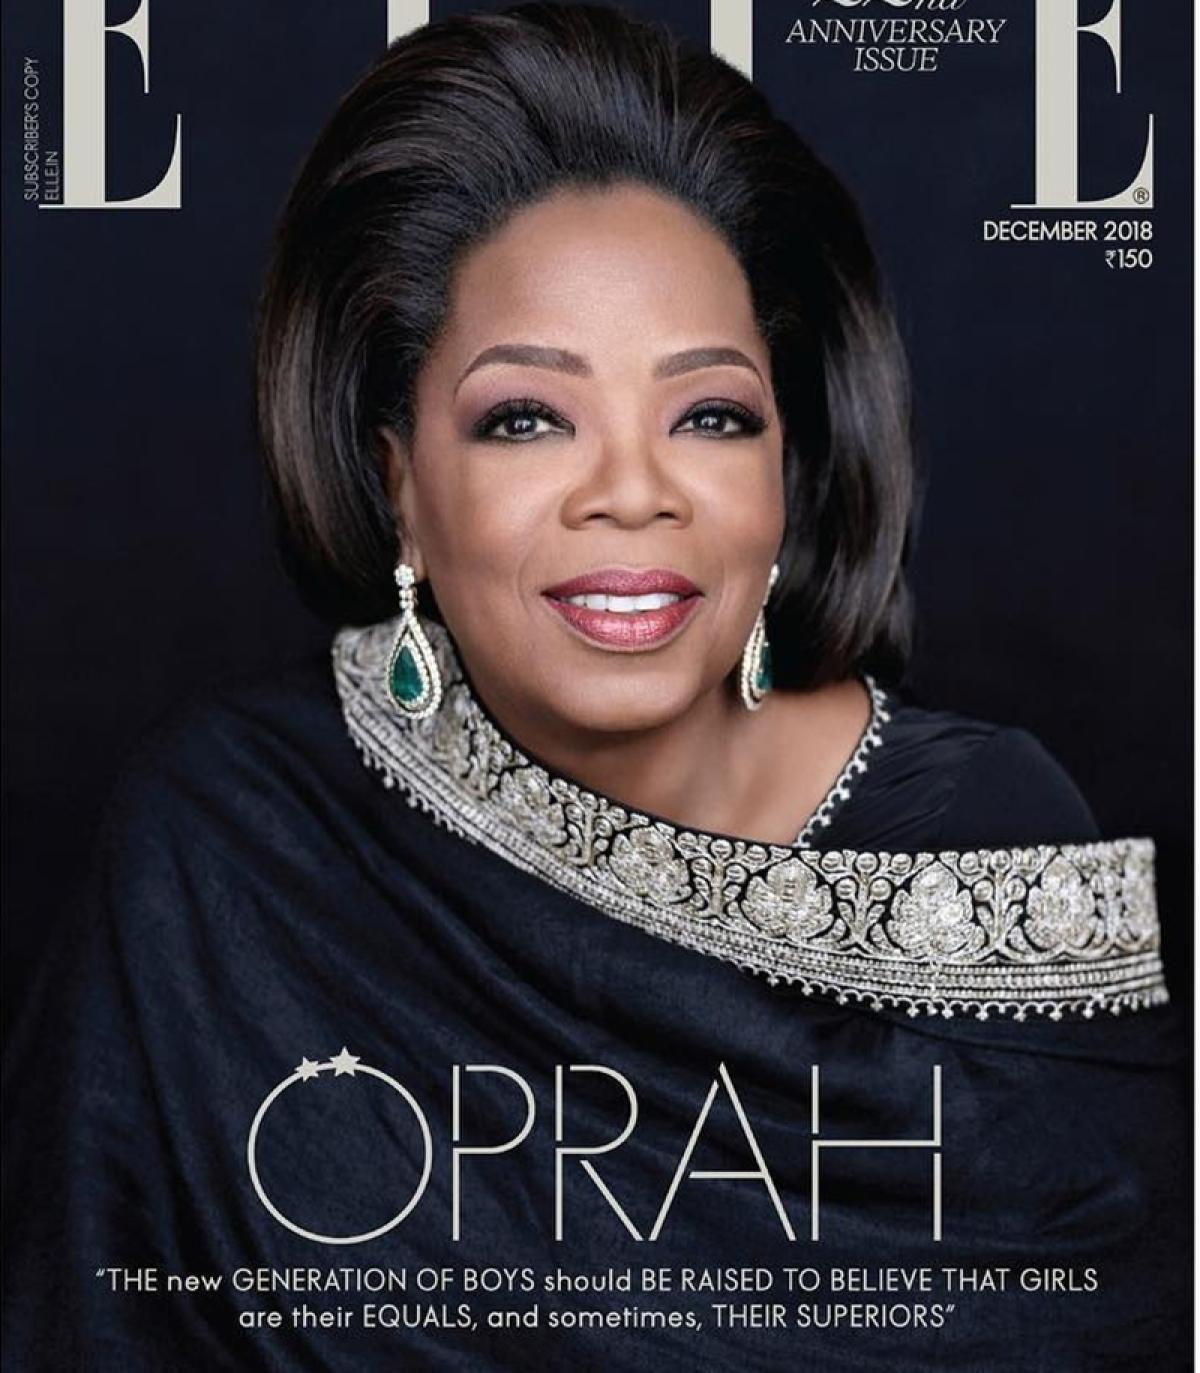 Oprah Winfrey dazzles in Sabyasachi Mukherjee ensemble